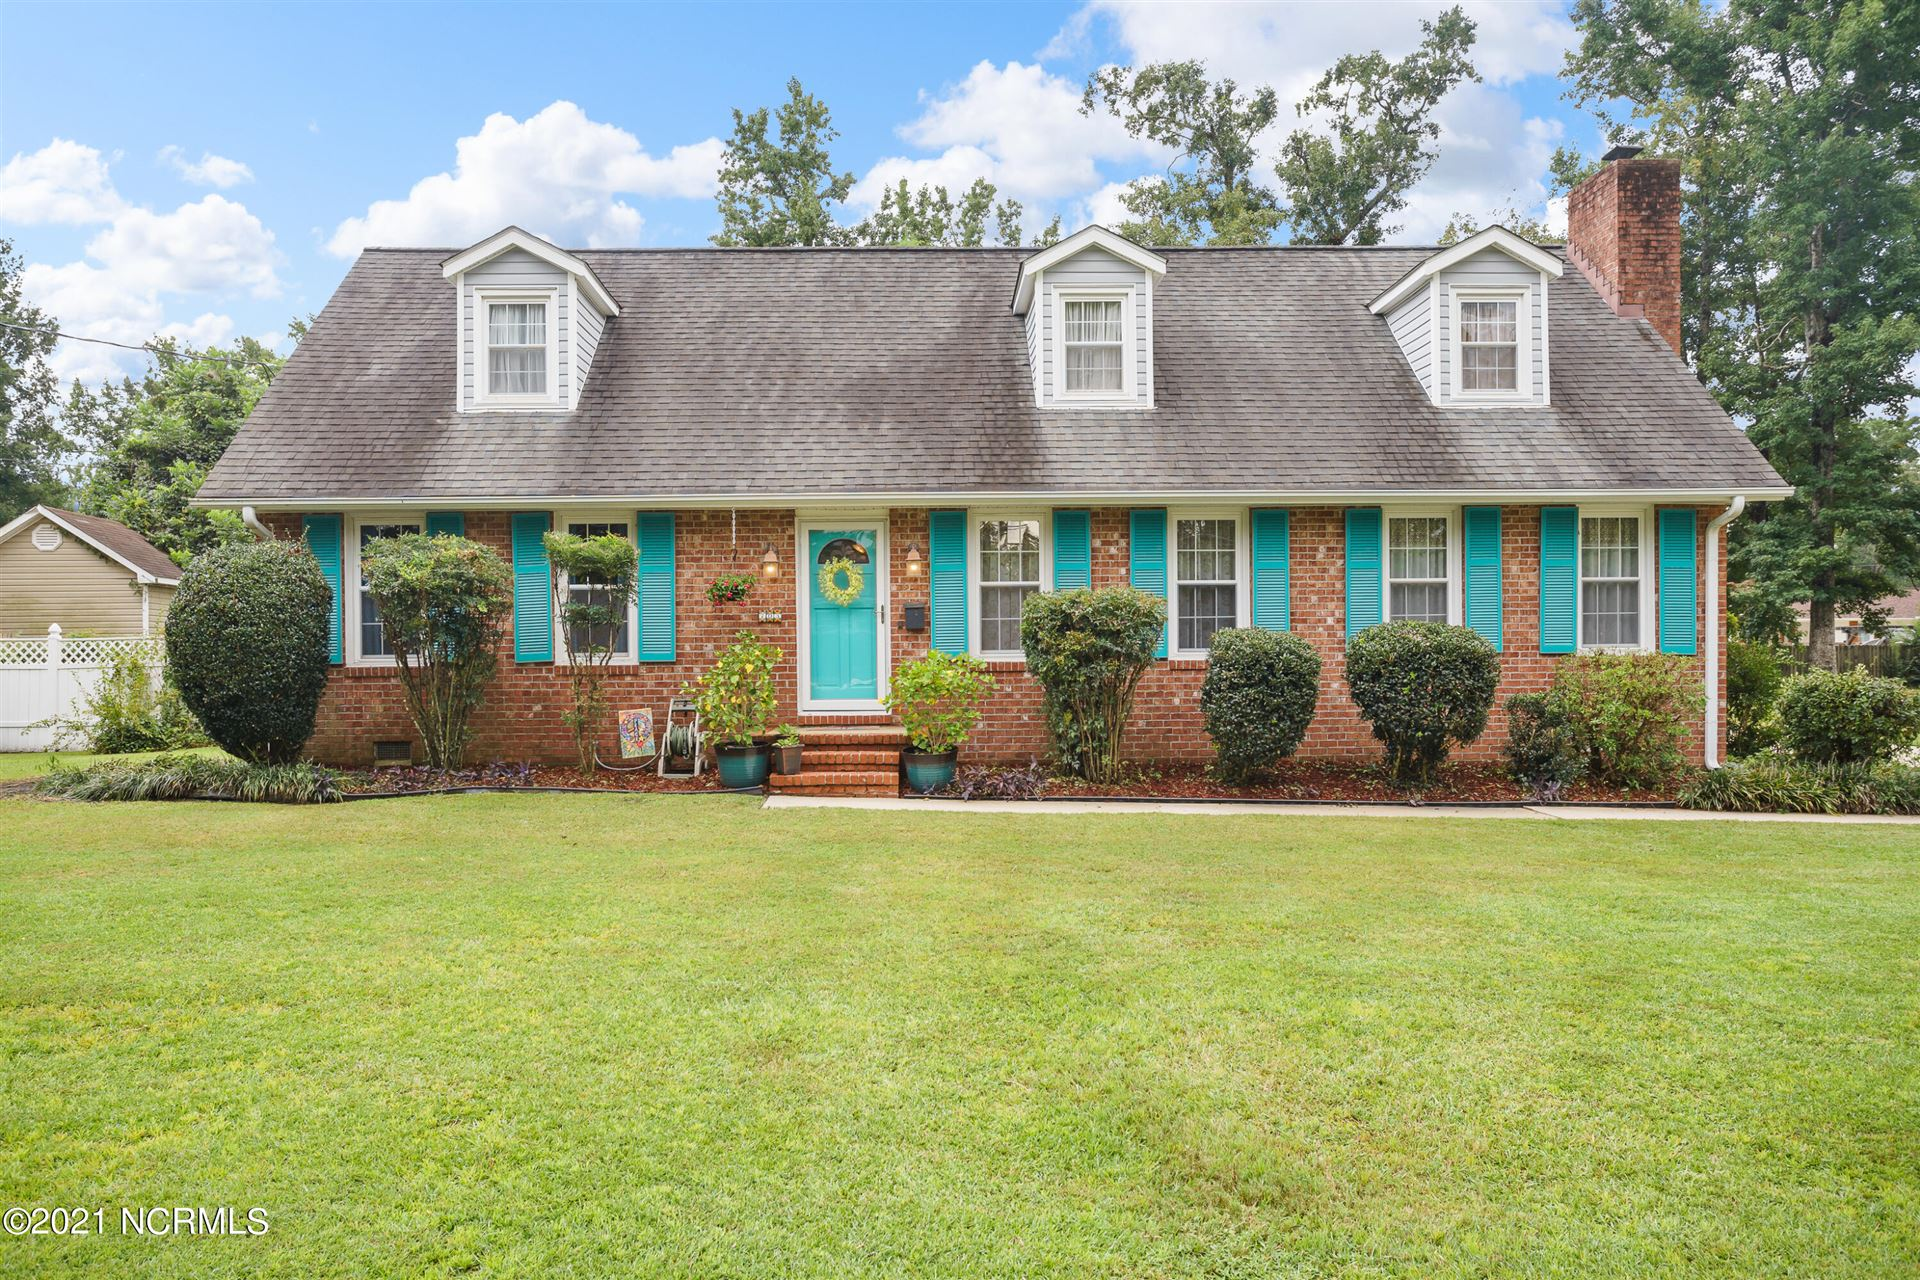 Photo of 703 Doris Avenue, Jacksonville, NC 28540 (MLS # 100290262)